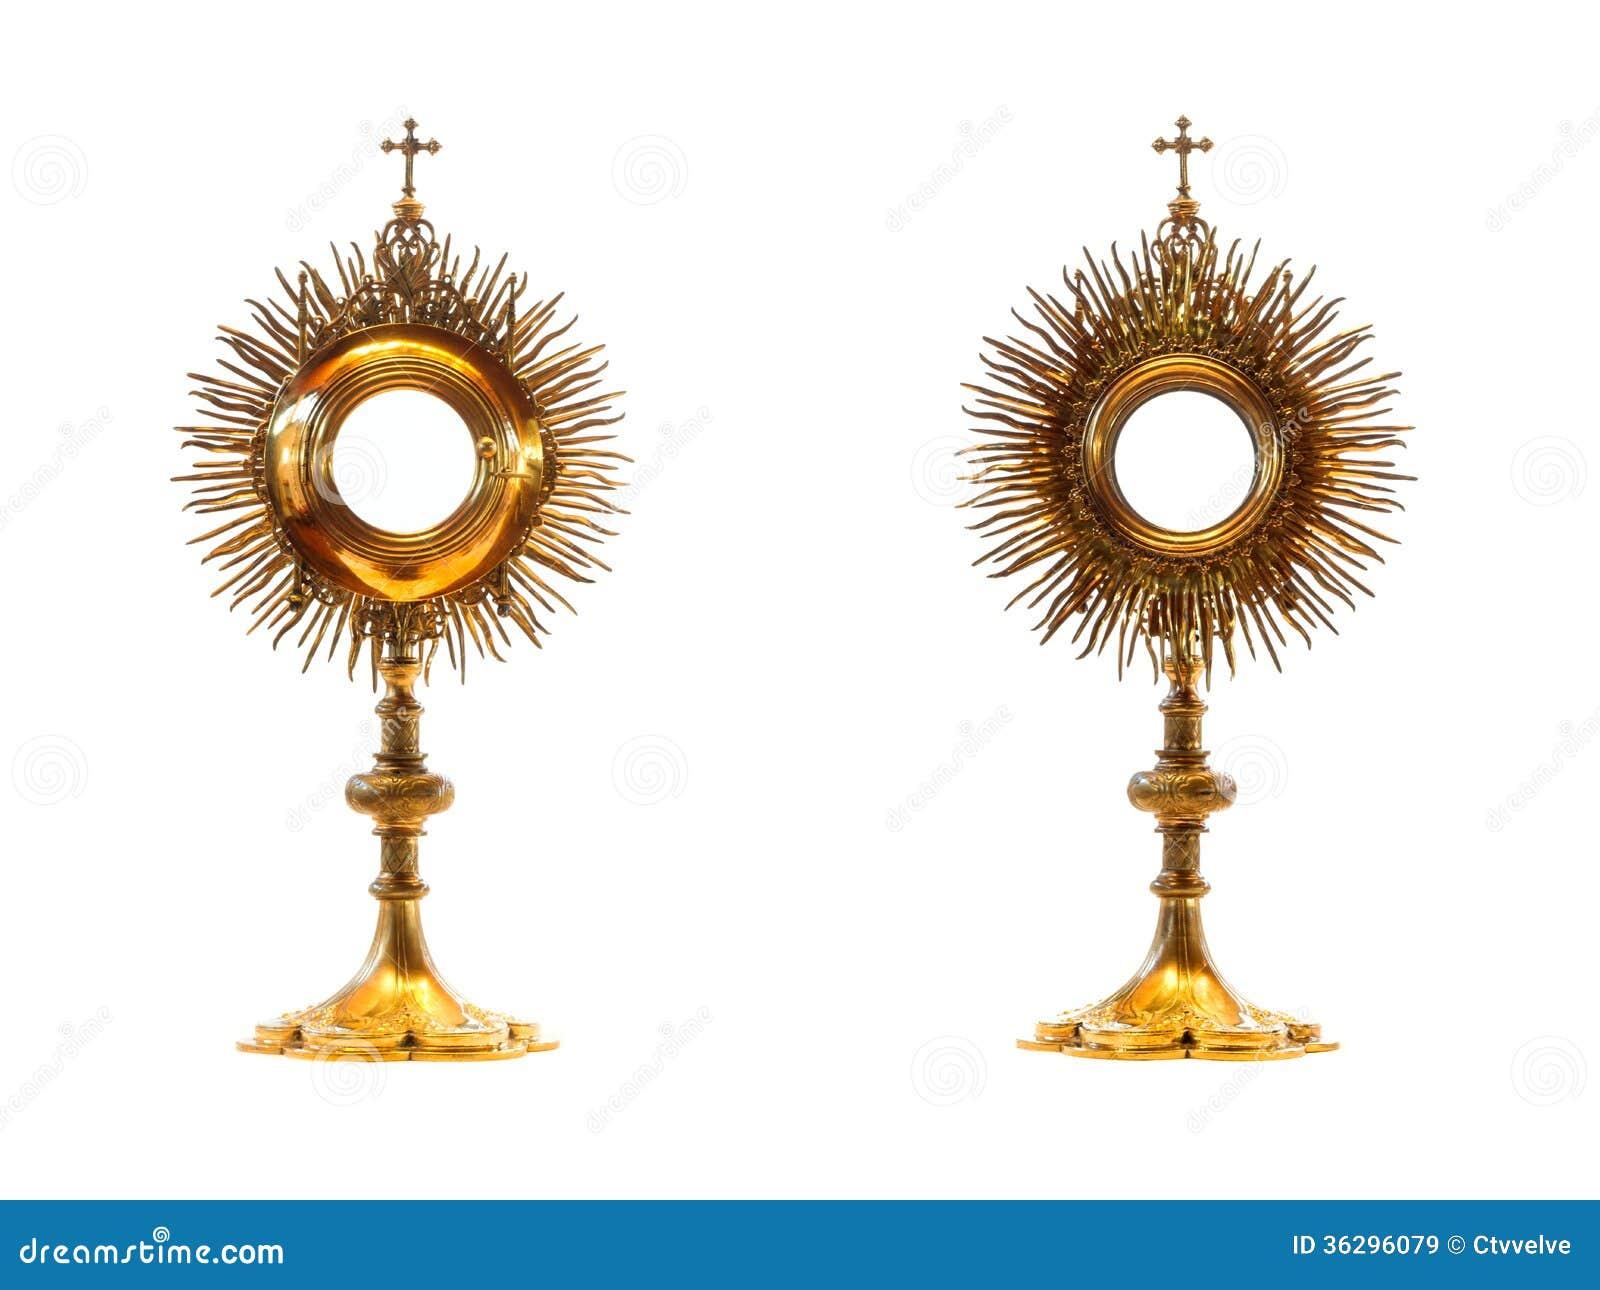 Liturgical Vessel Gold Monstrance Royalty Free Stock